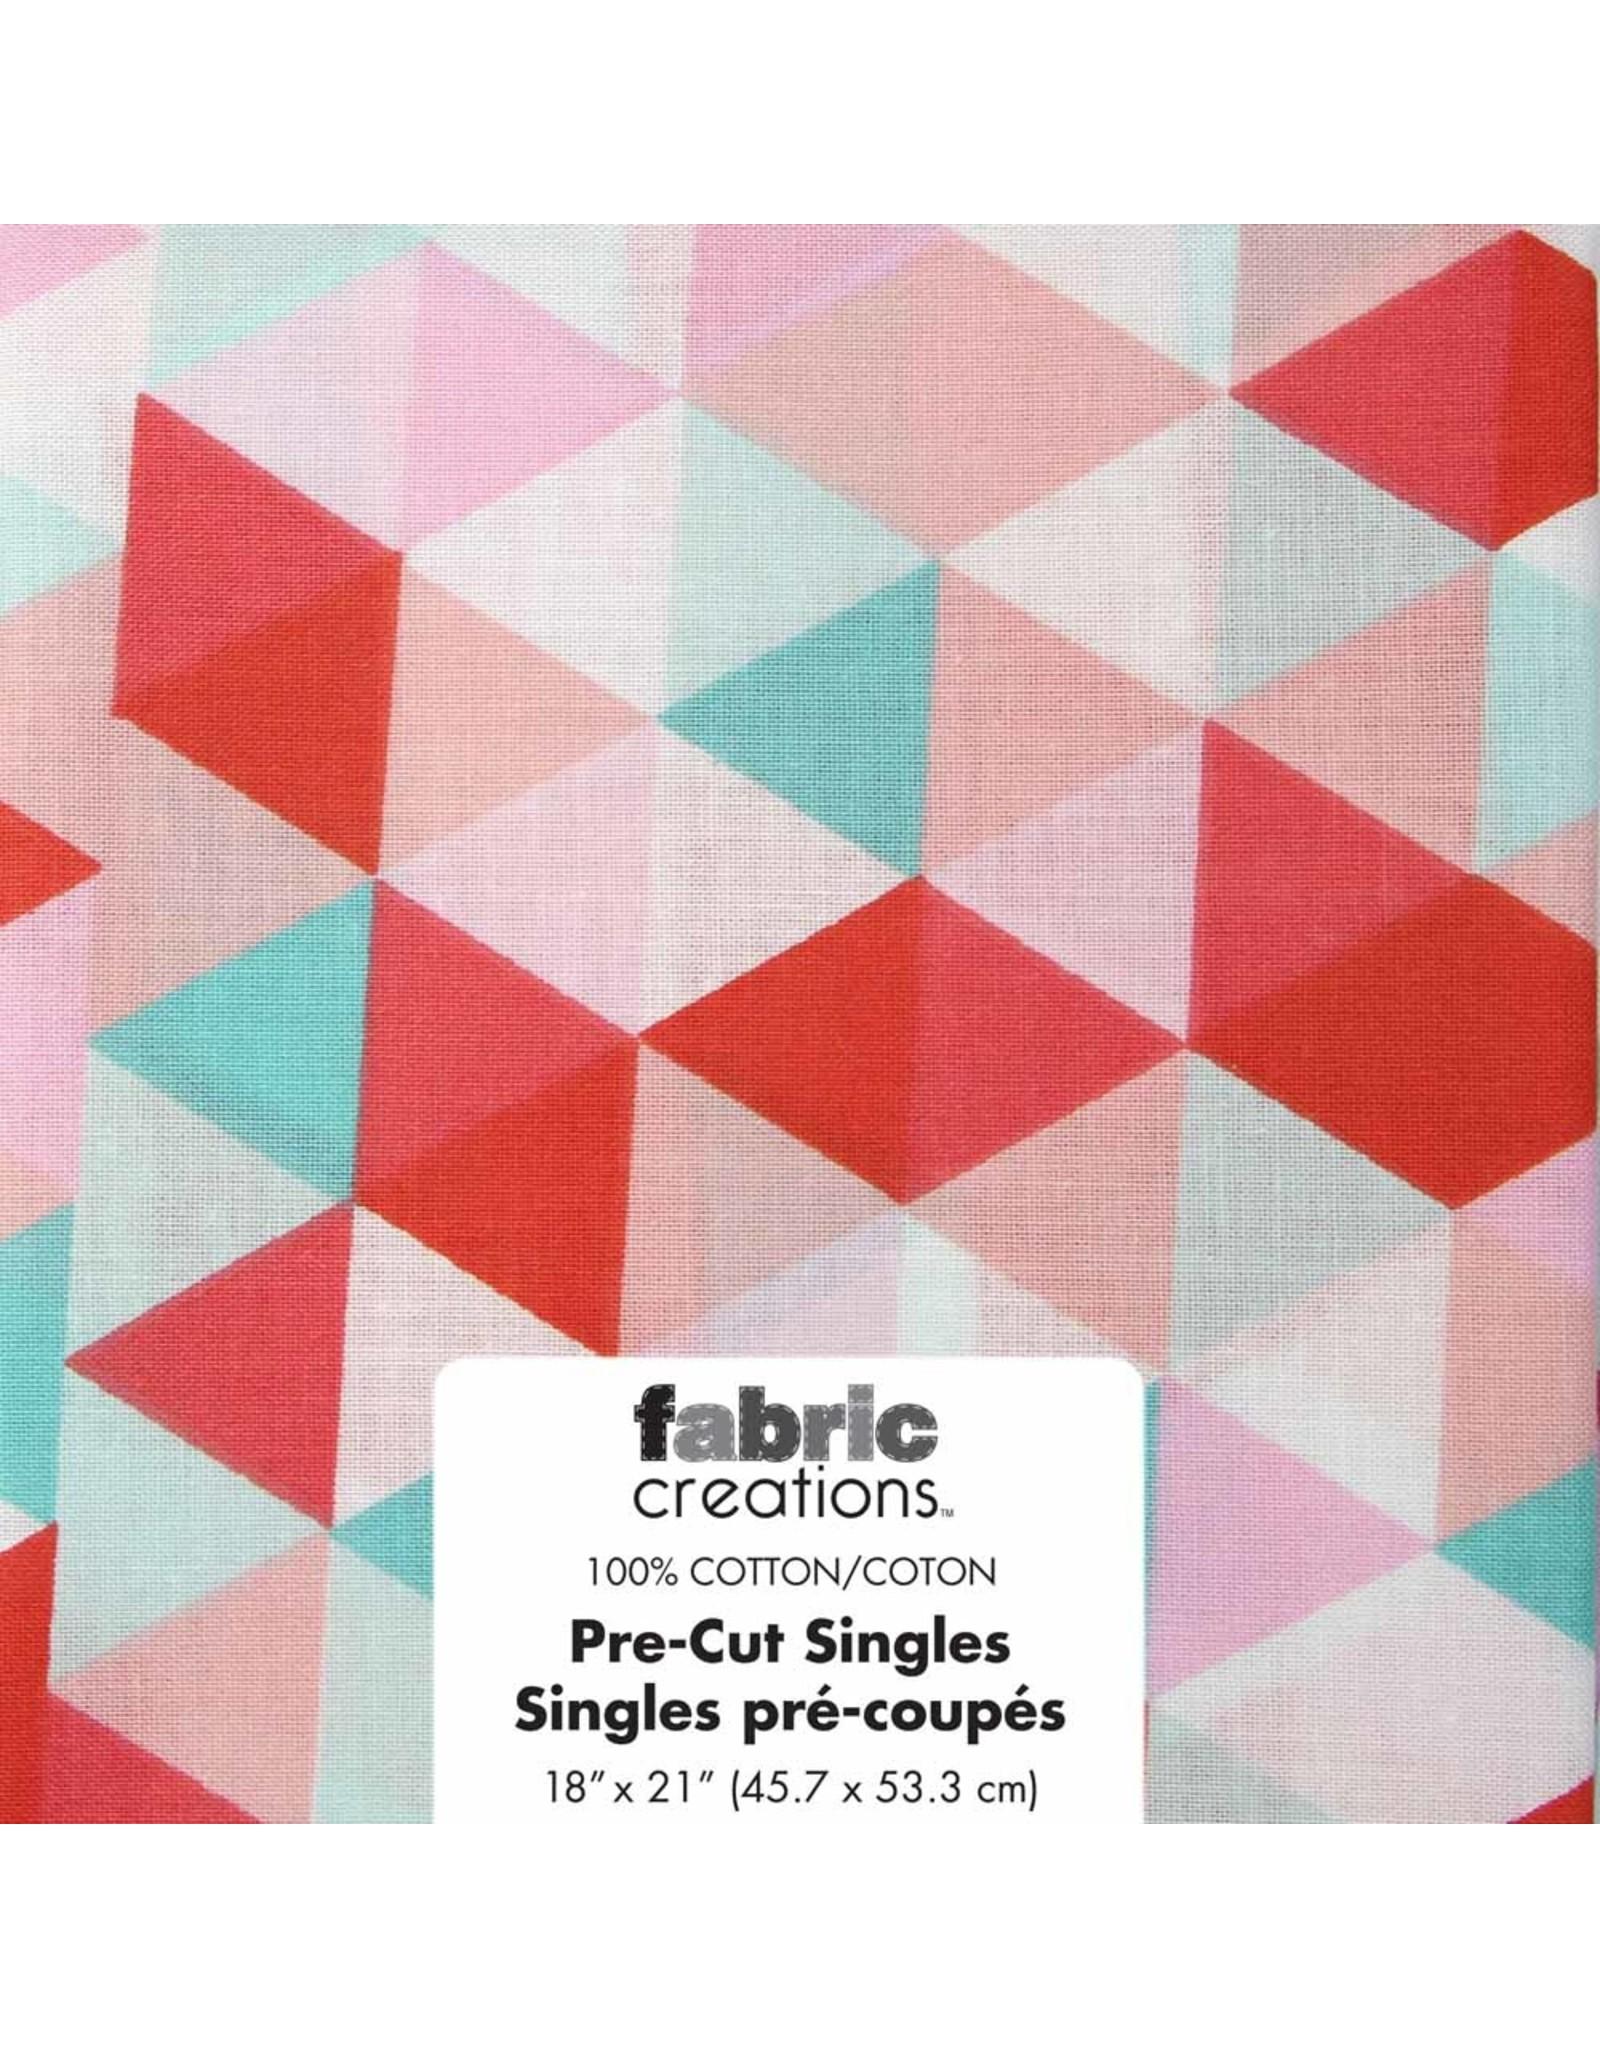 Fabric Creations Fat Quarter Bundle